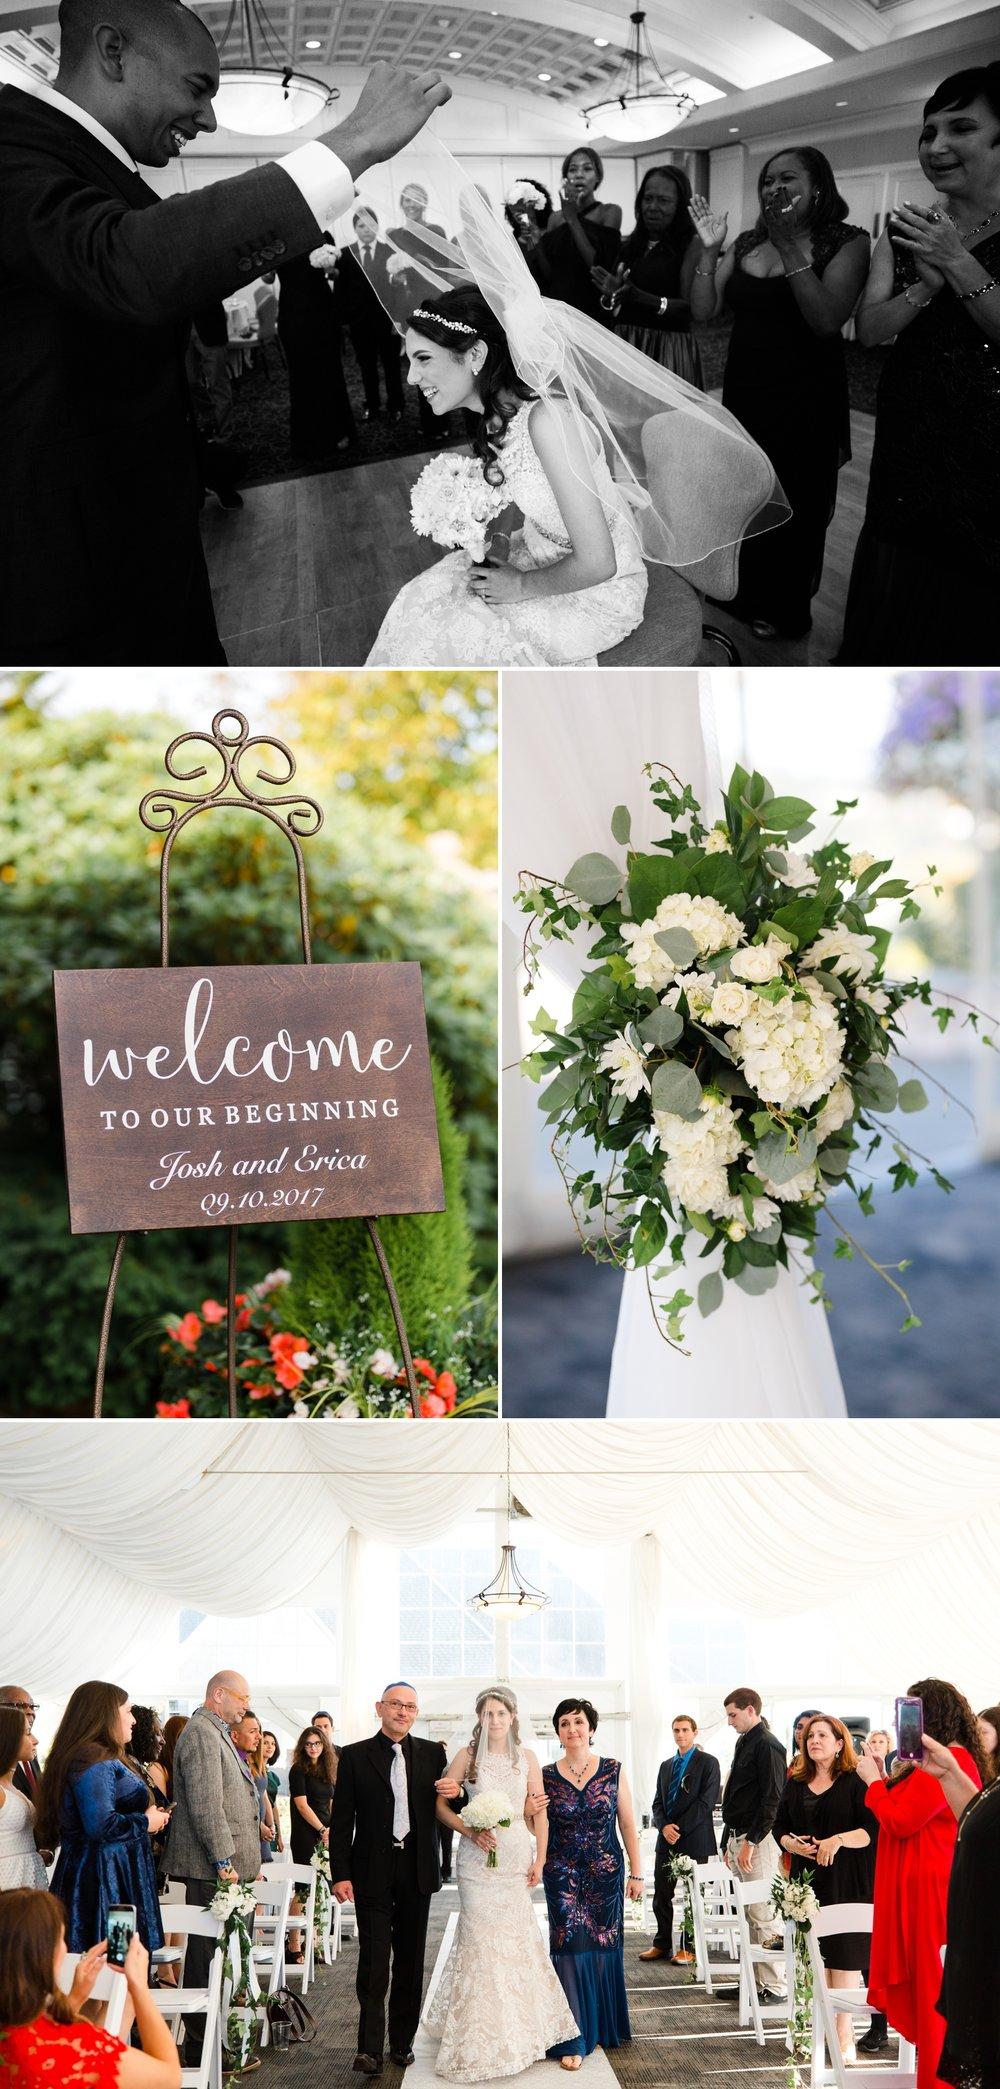 15-jewish-wedding-seattle.jpg